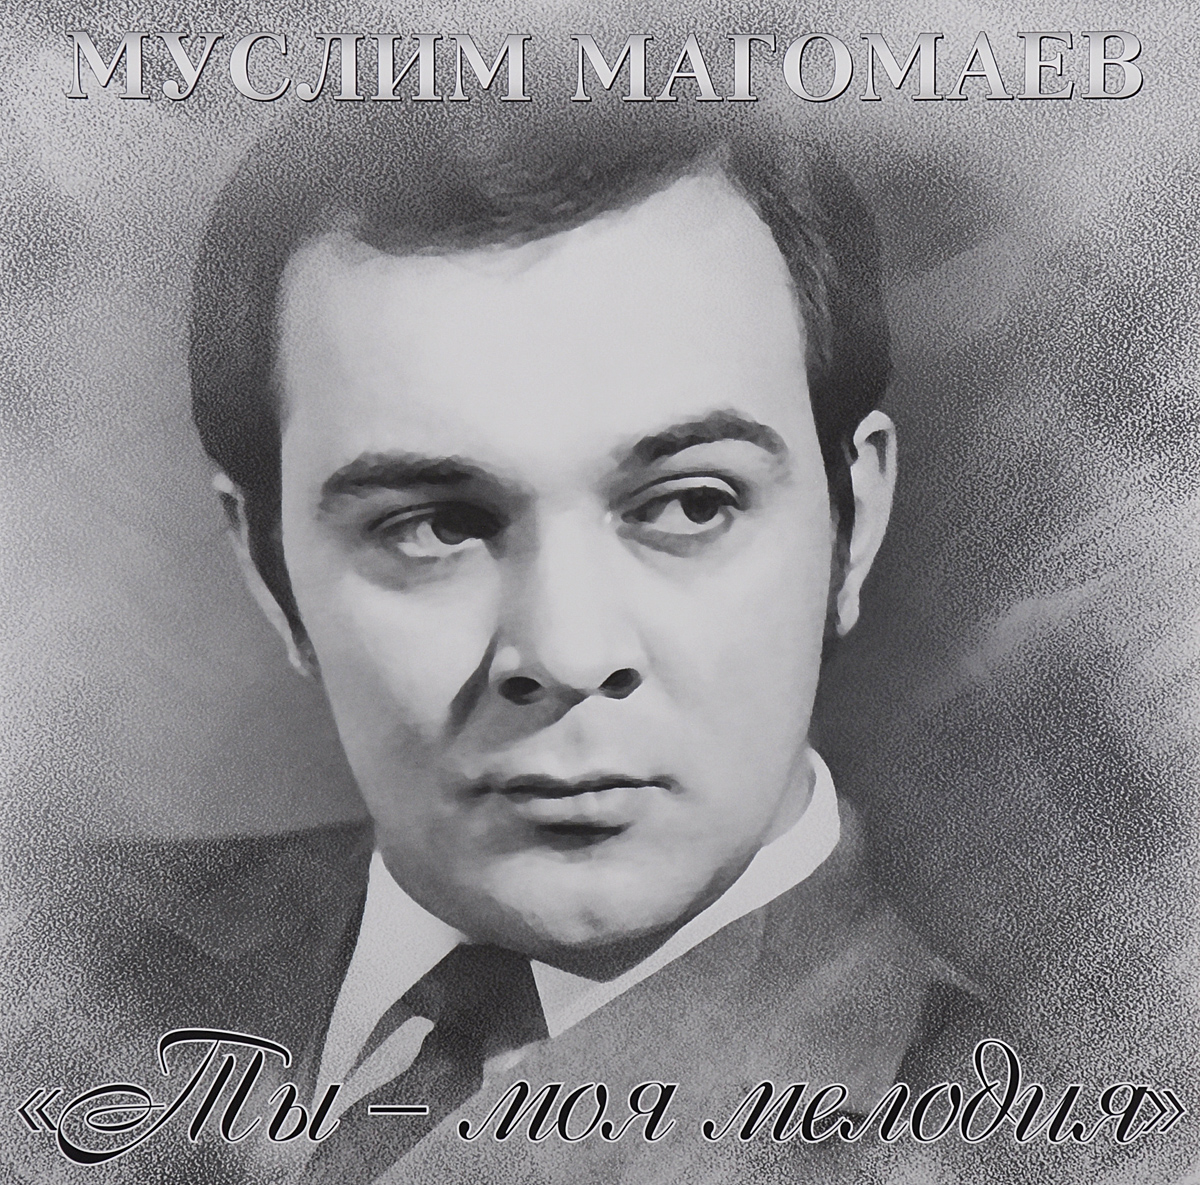 Муслим Магомаев Муслим Магомаев. Ты - моя мелодия (LP) муслим магомаев муслим магомаев поет муслим магомаев